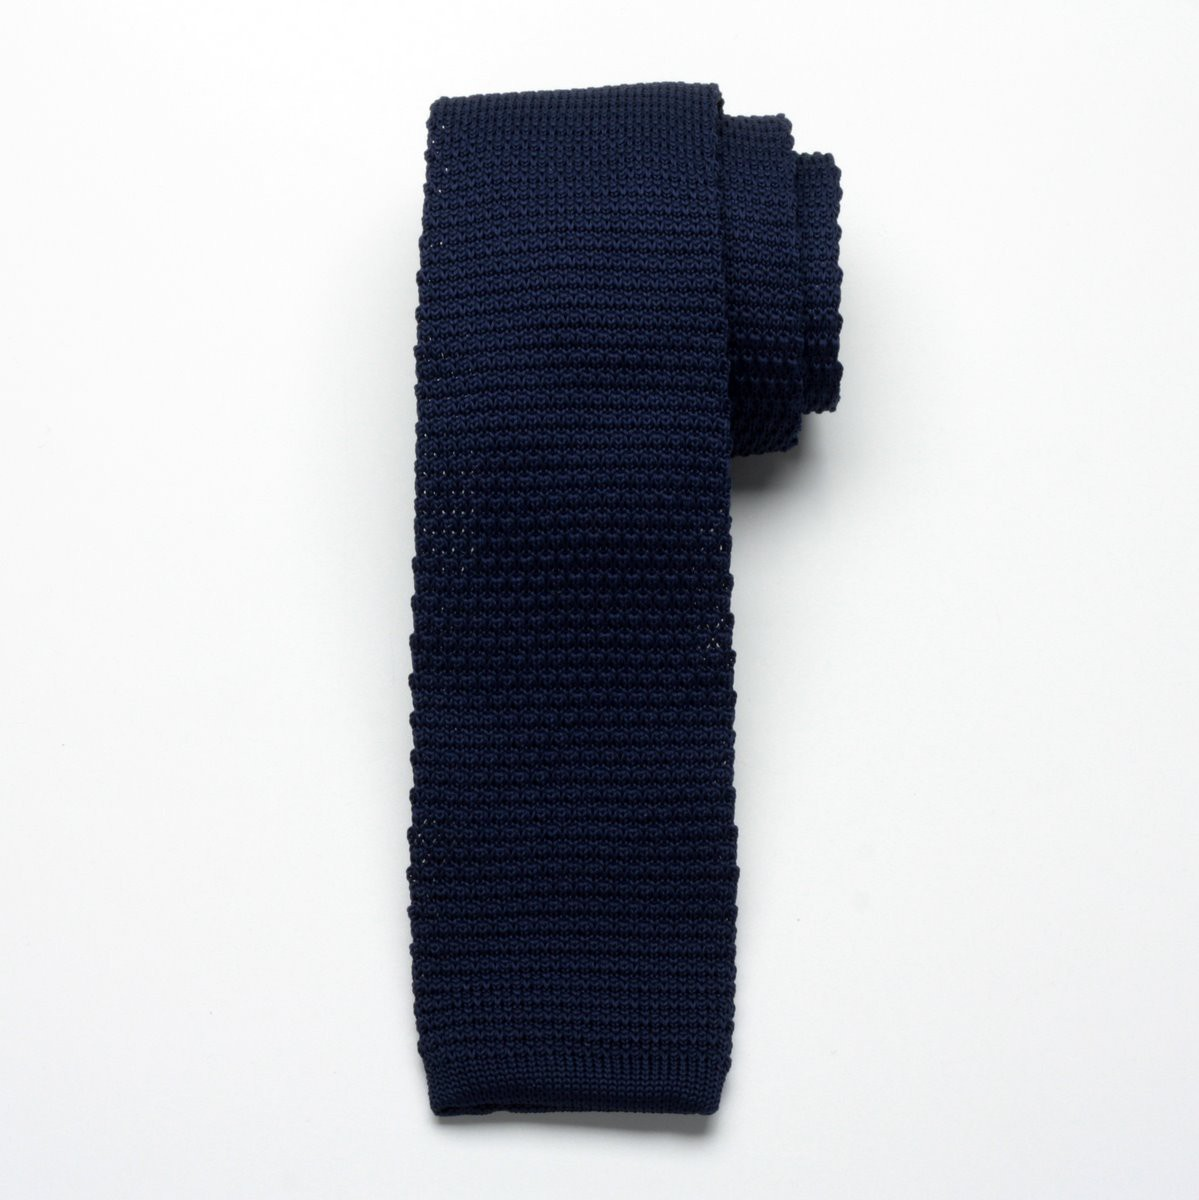 Krawat tkany Willsoor - granatowy